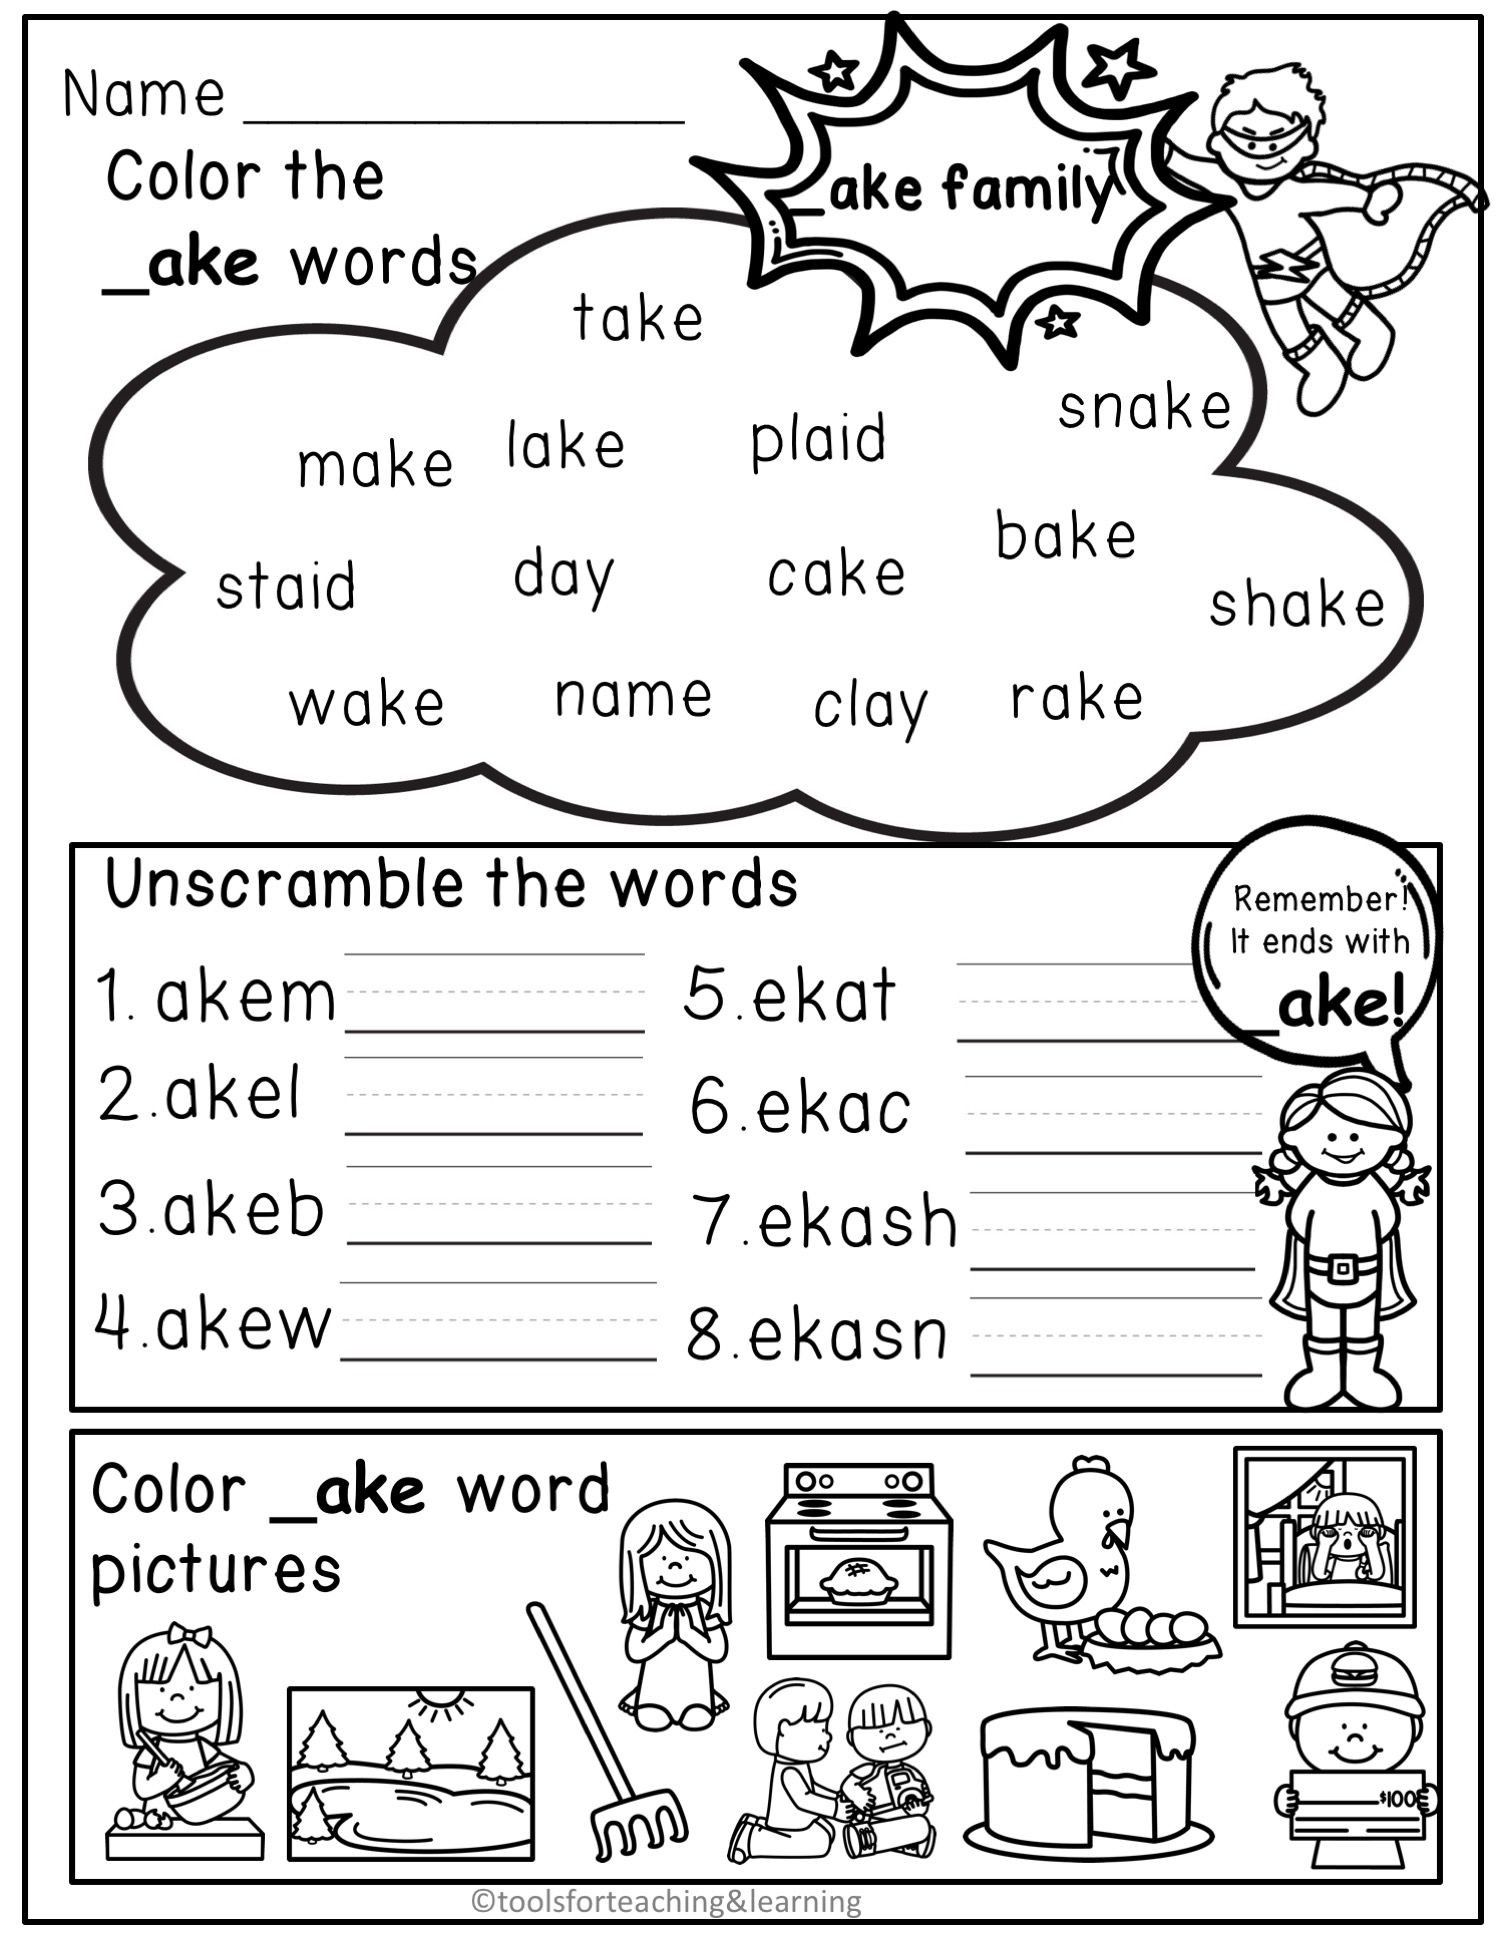 4 Worksheet Word Families Can Long Vowels Word Families Worksheets Word Family Worksheets Word Families Kindergarten Word Families Worksheets [ 1941 x 1500 Pixel ]